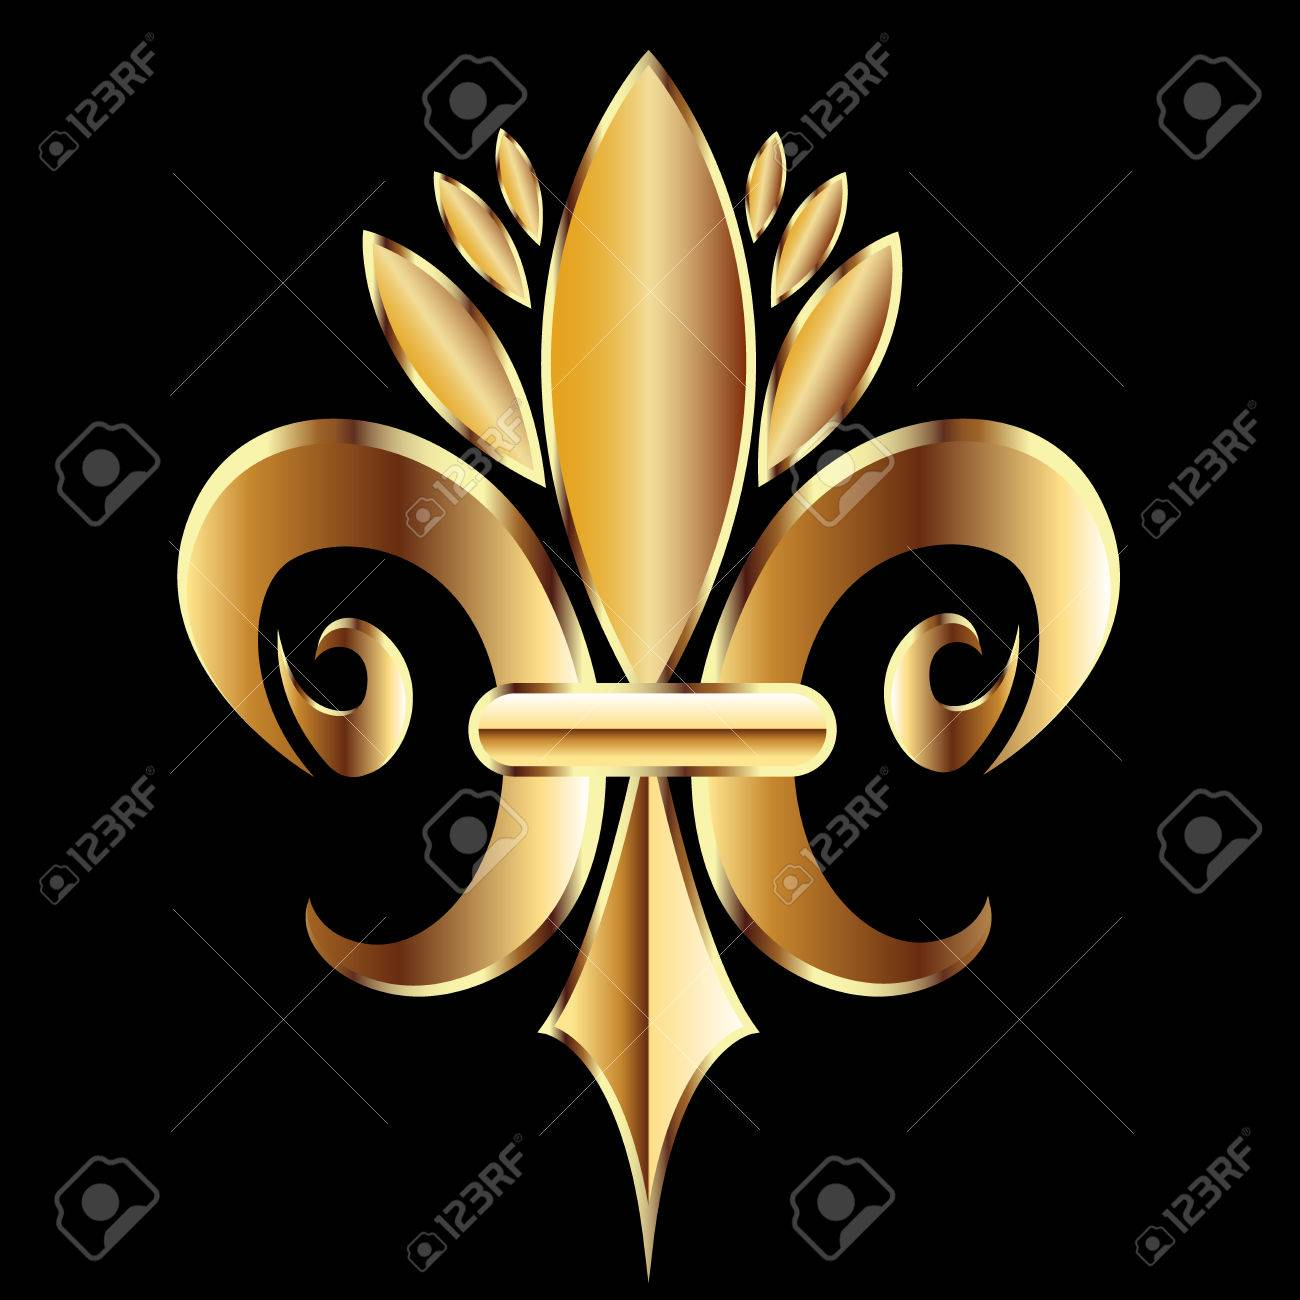 Gold fleur de lis flower new orleans symbol logo icon vector flower new orleans symbol logo icon vector image template stock vector buycottarizona Choice Image